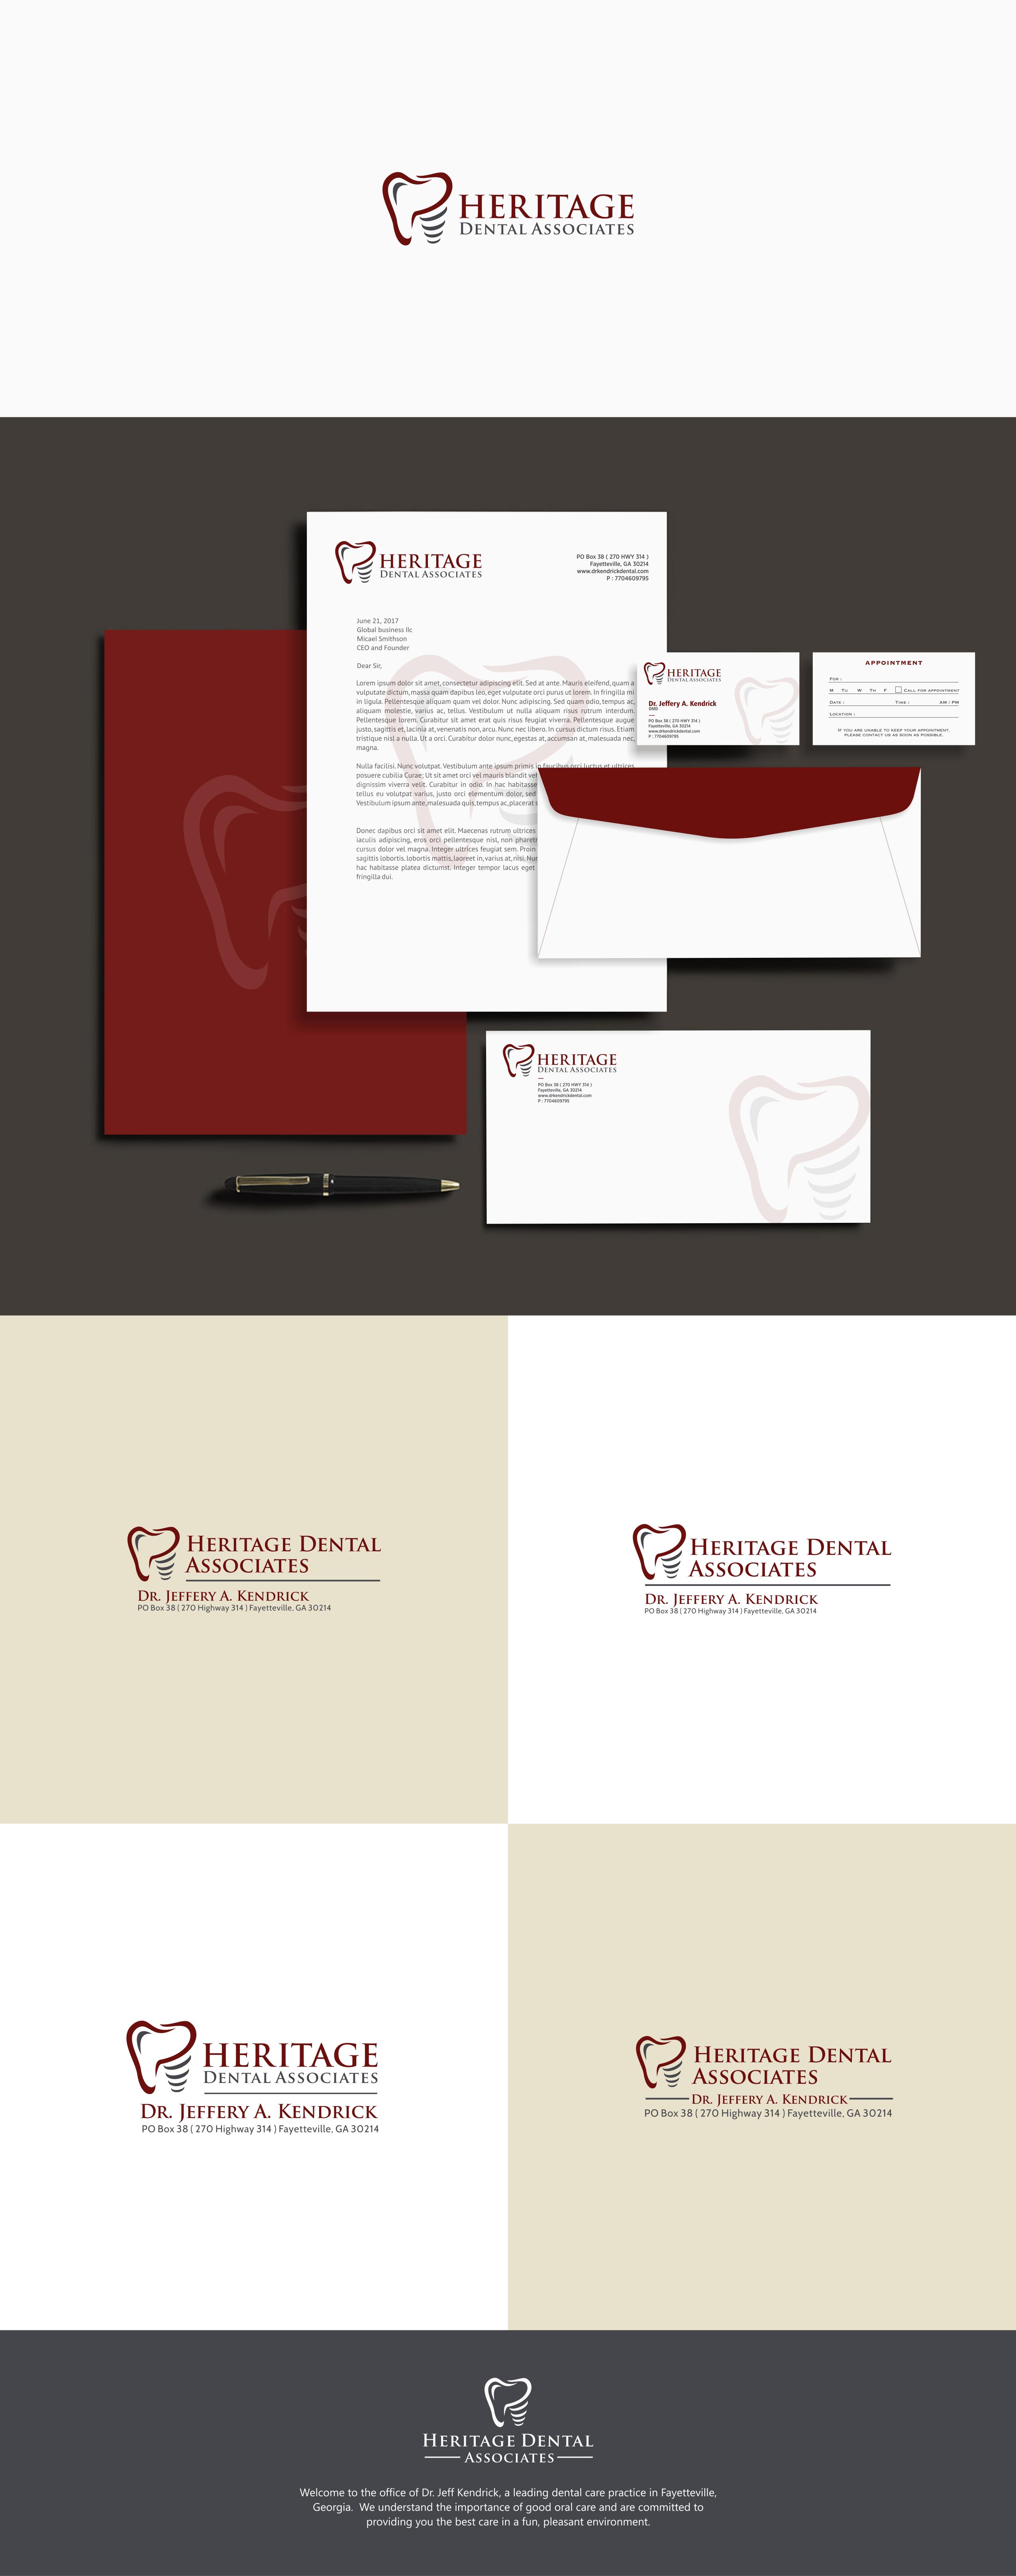 Heritage Dental needs a creative logo